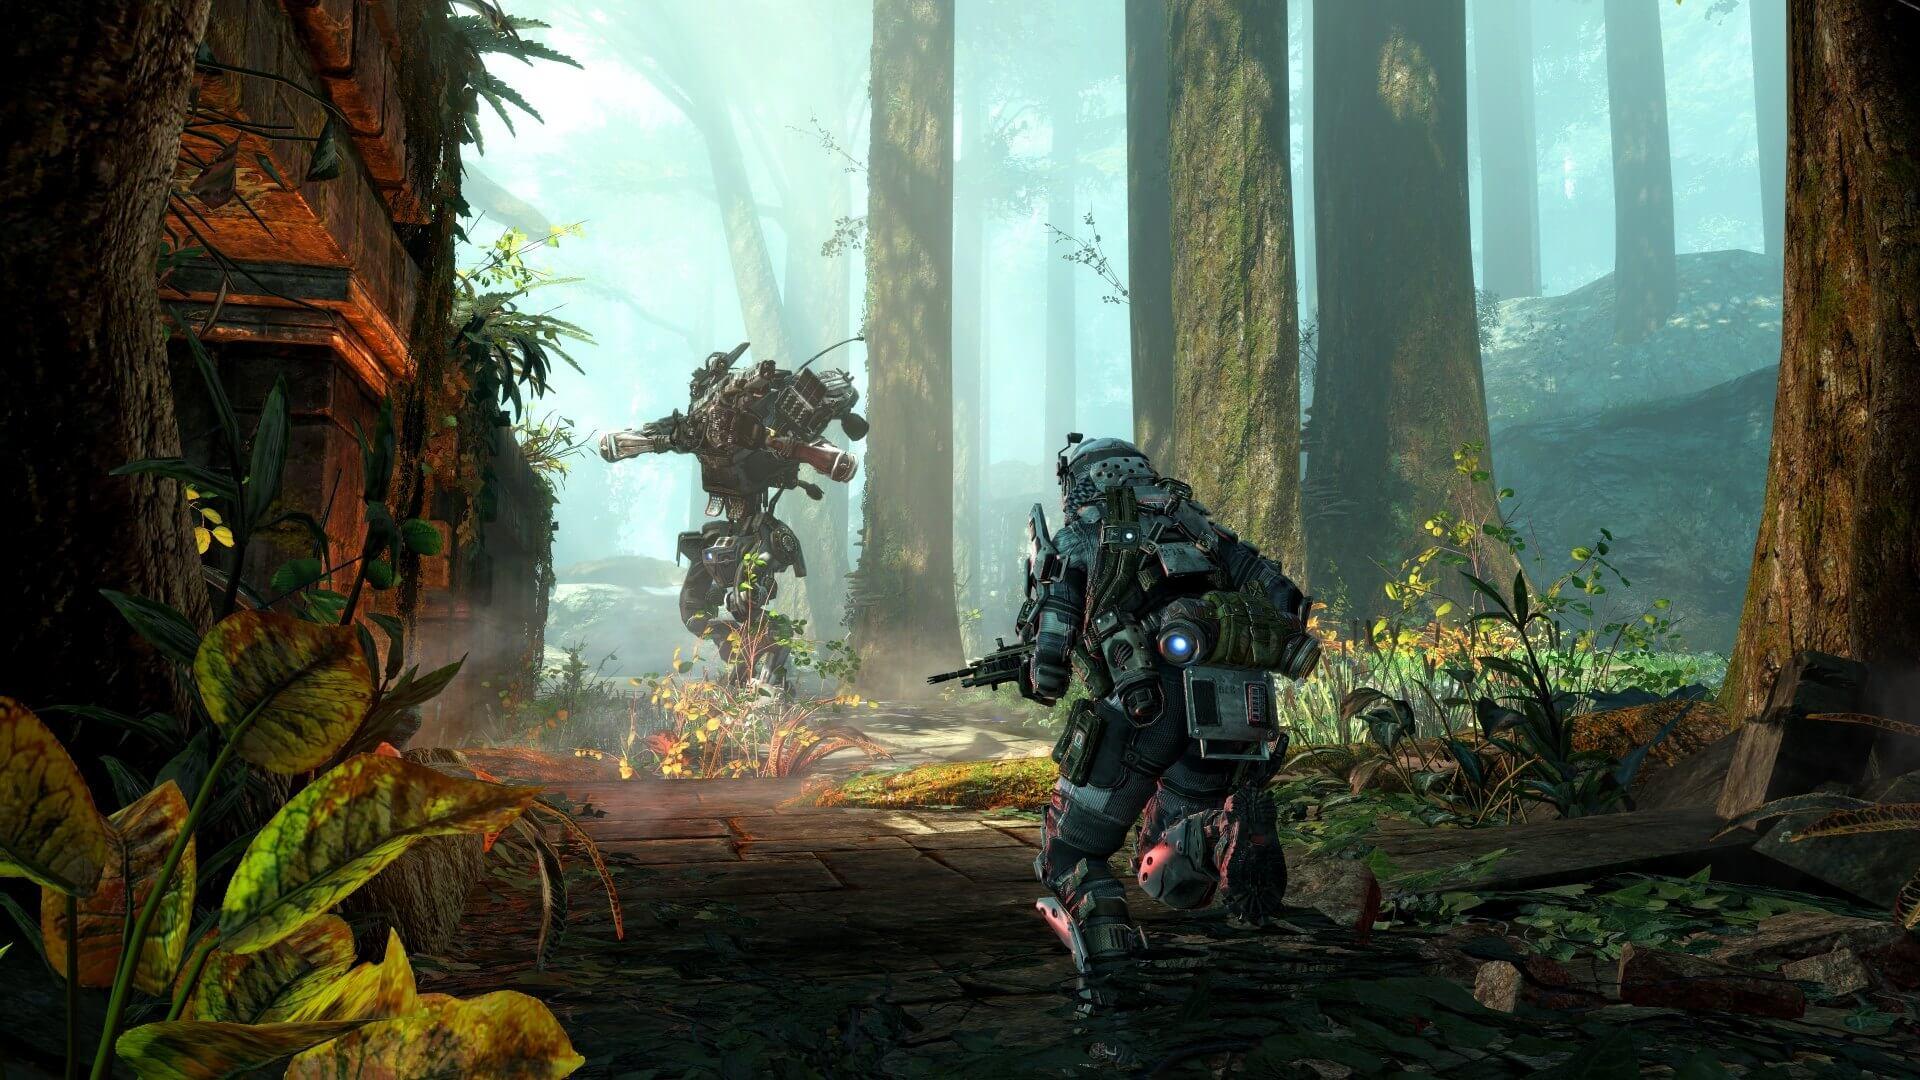 Titanfall: 'Expedition' DLC Screenshots Show New Maps